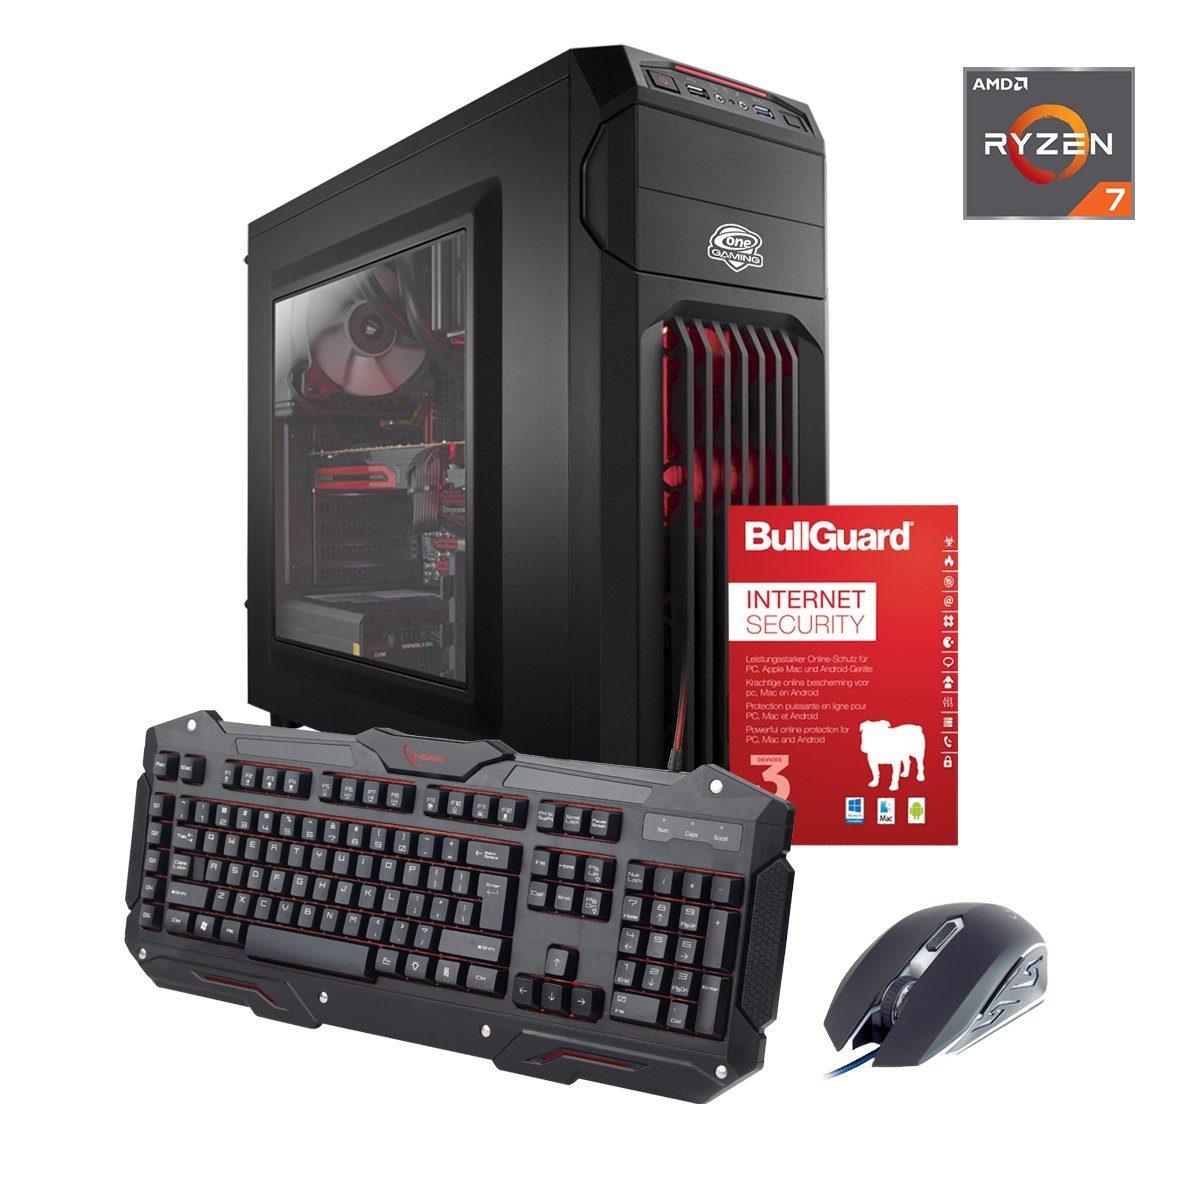 ONE GAMING PC, Ryzen 7 1700X, GeForce GTX 1080, 16GB DDR4 SDRAM »PC 44551«